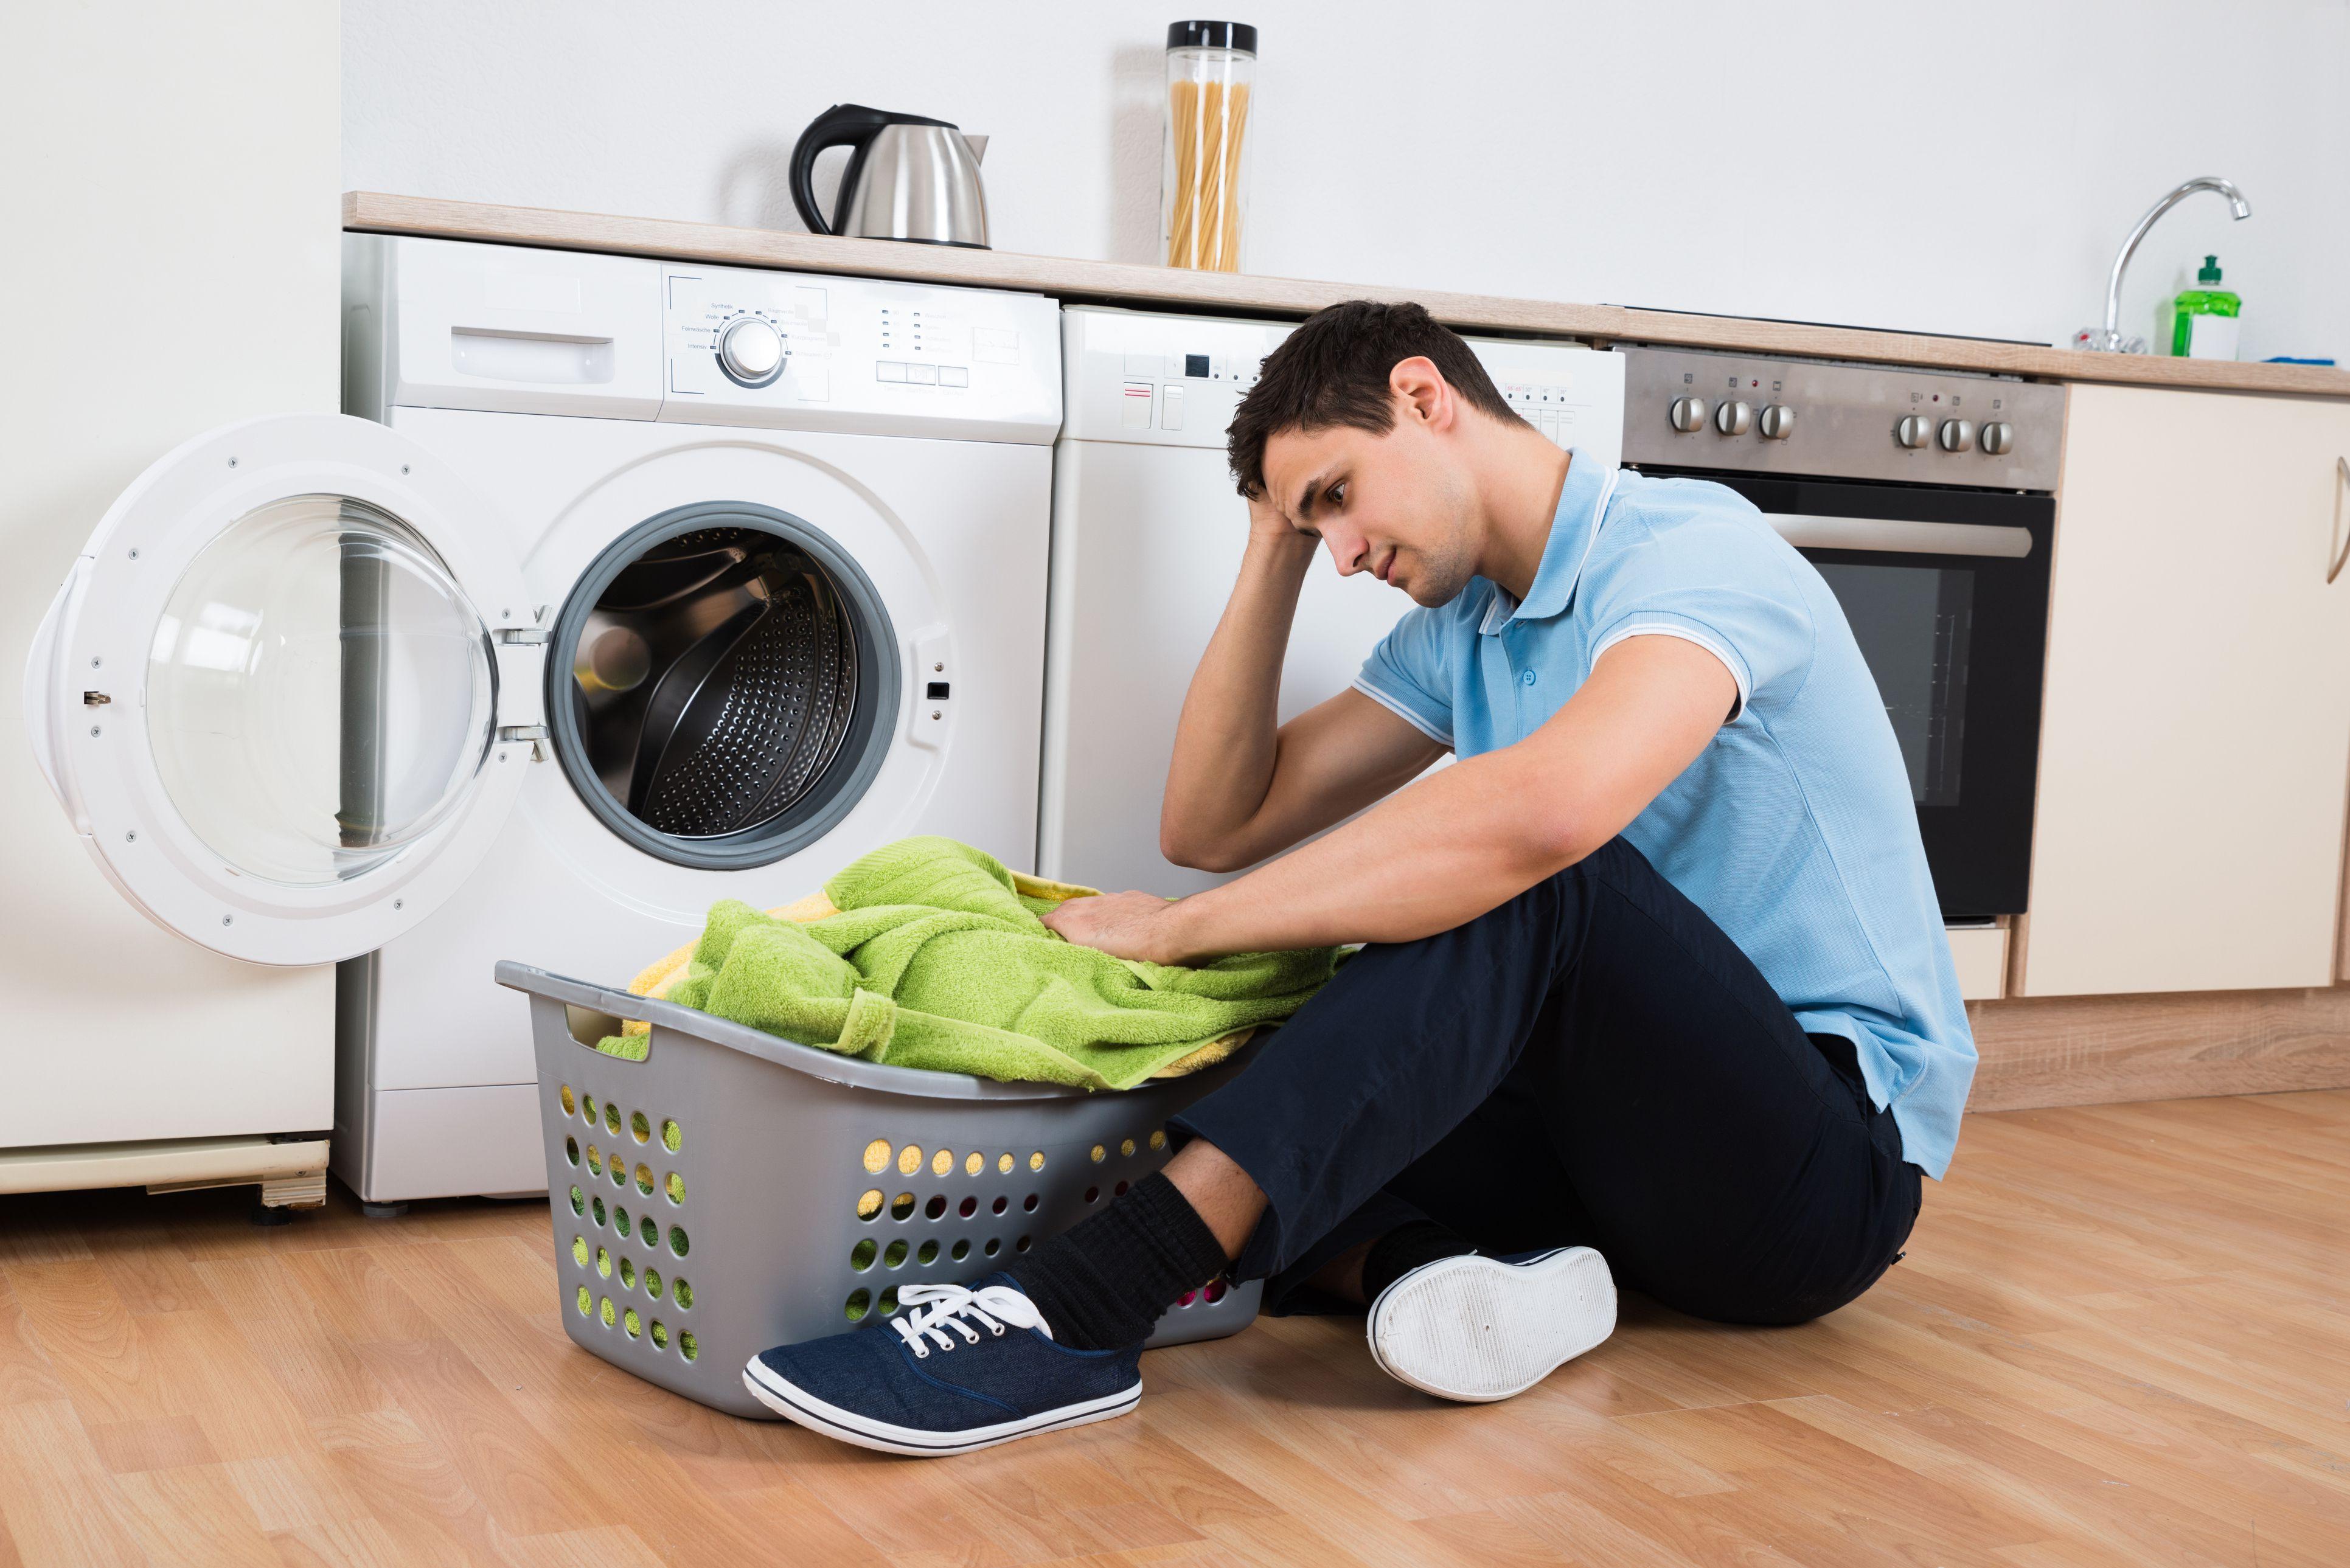 Tensed man looking at laundry basket by washing machine